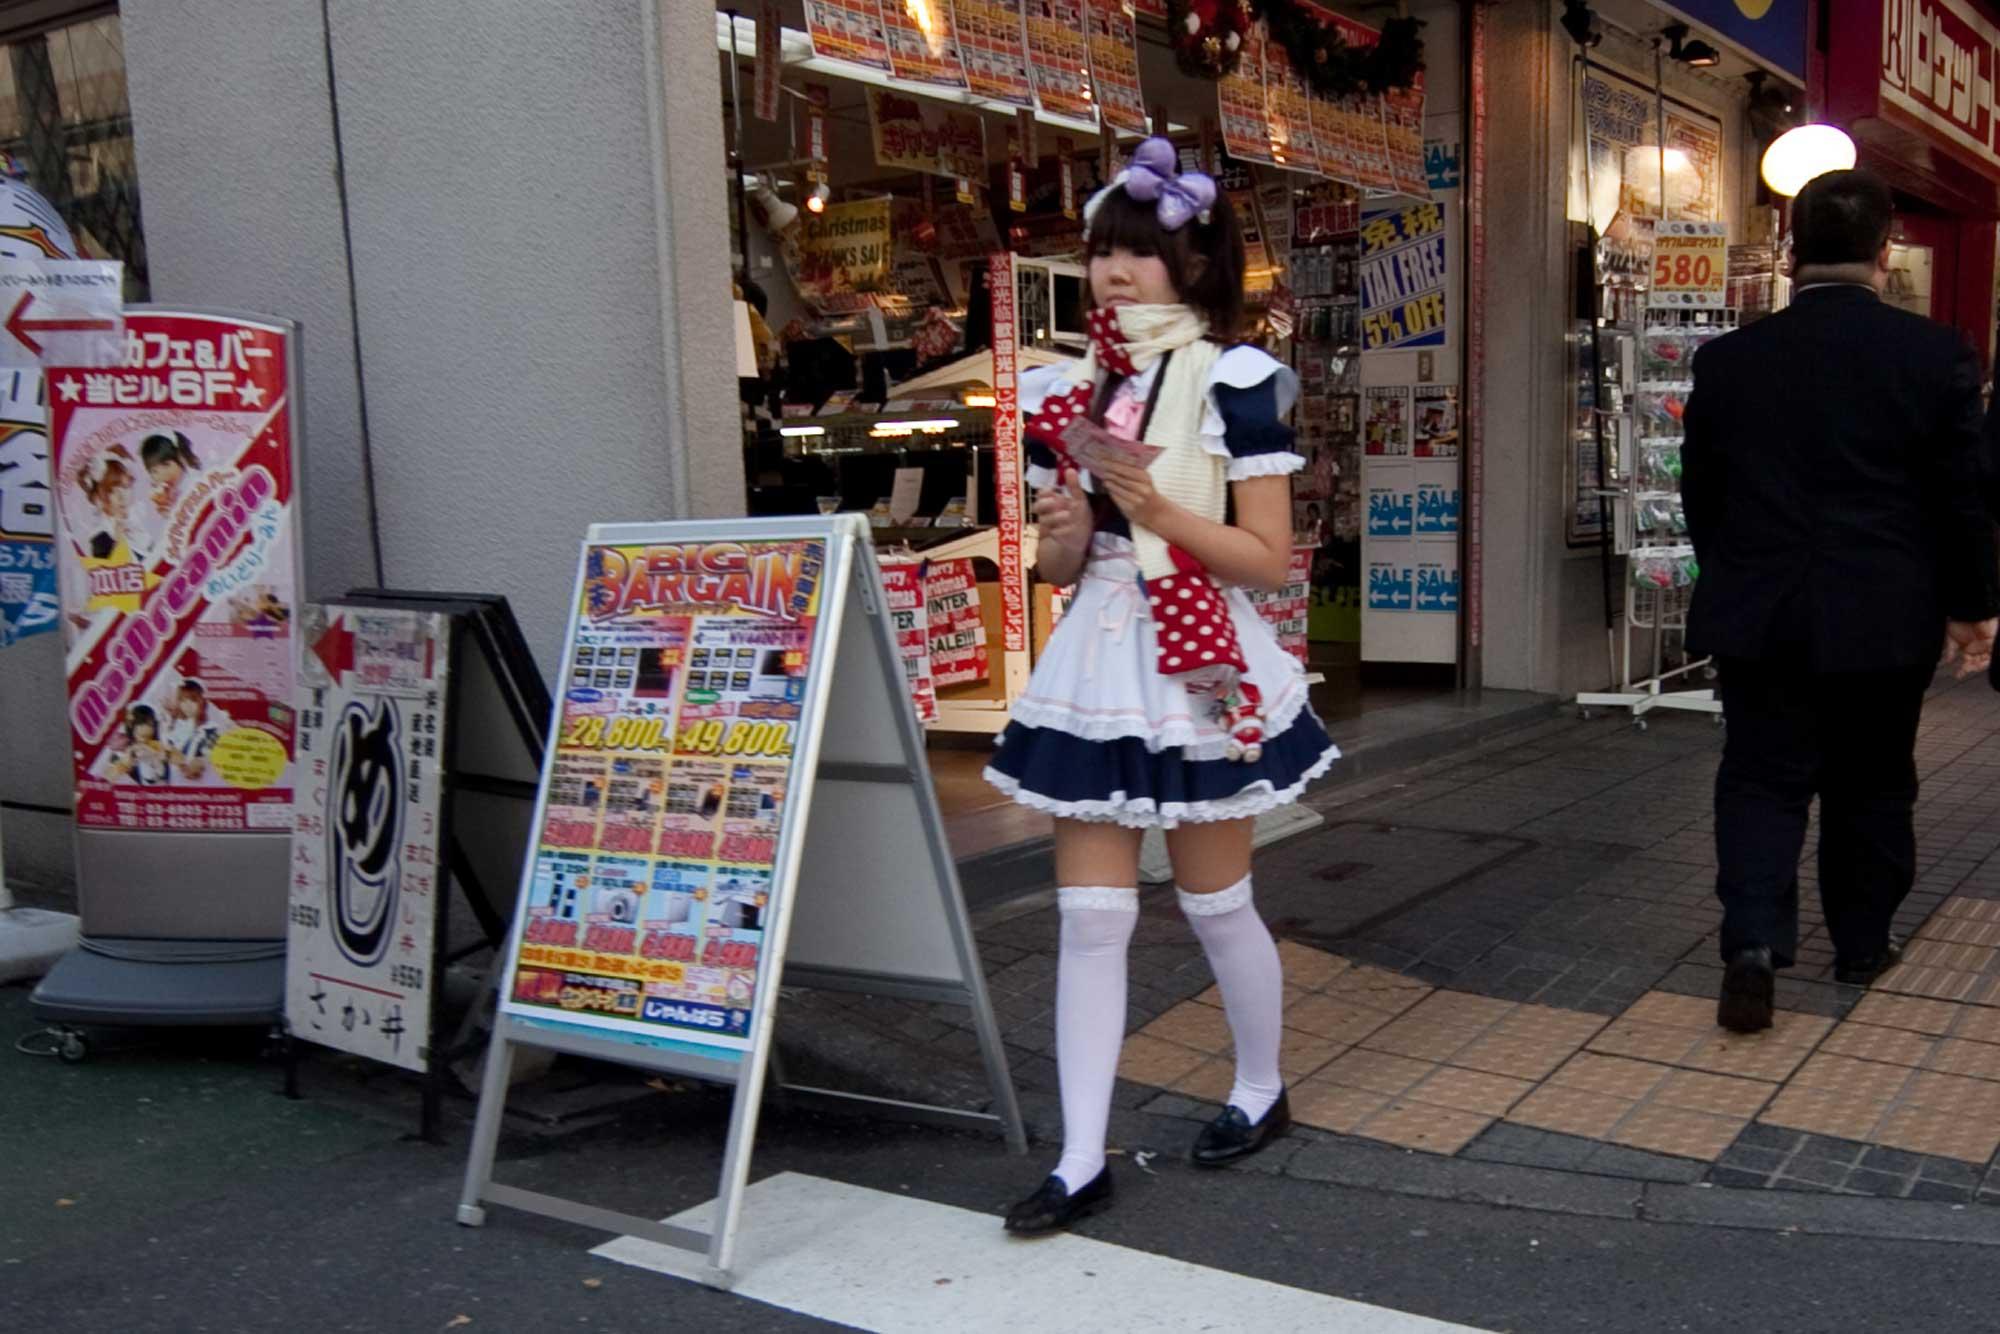 2010_Japan_Image_019.jpg